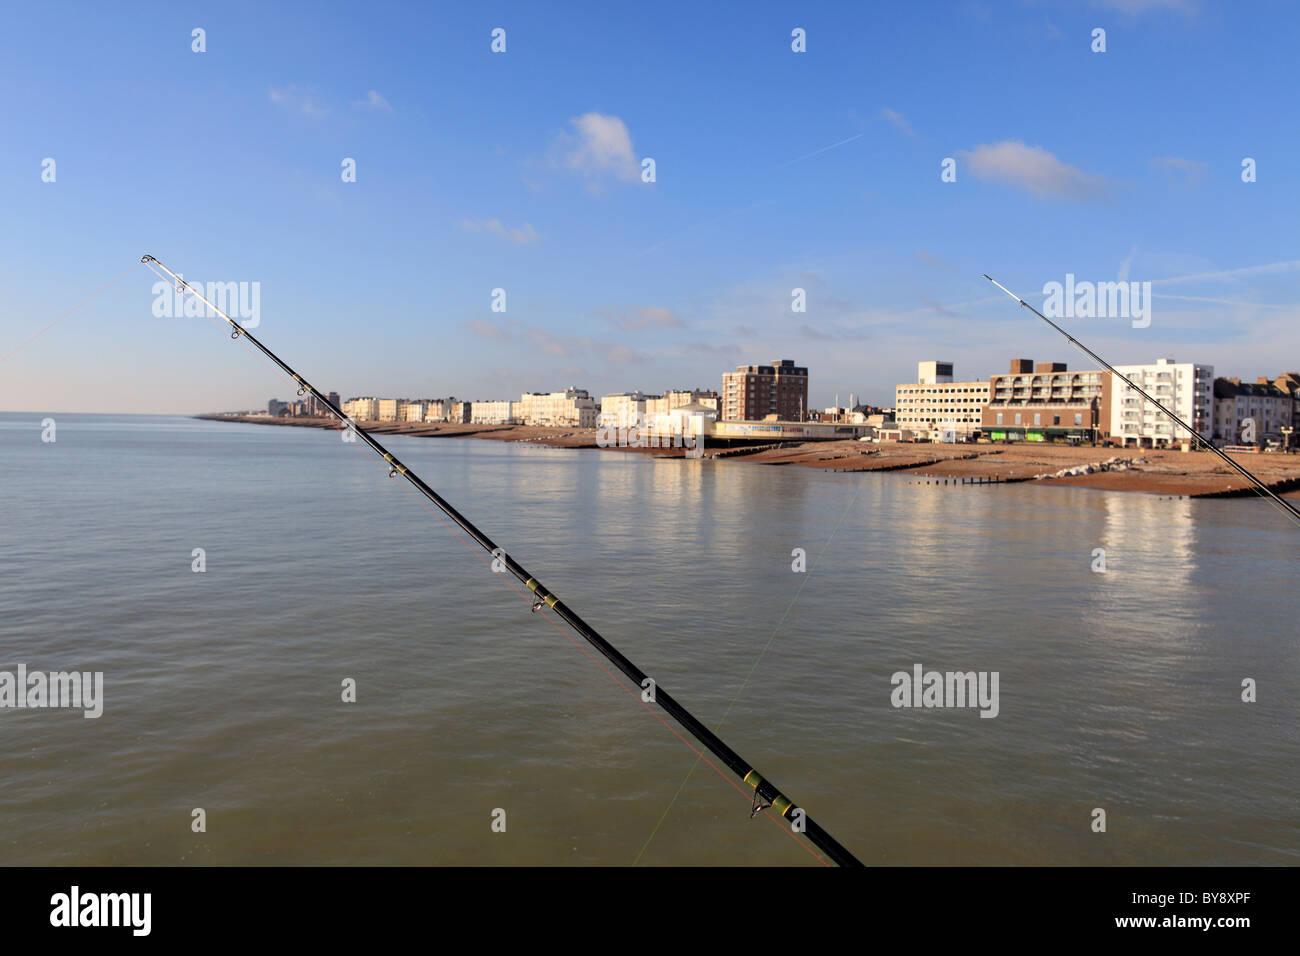 West Sussex Reino Unido worthing pescar en el muelle Imagen De Stock